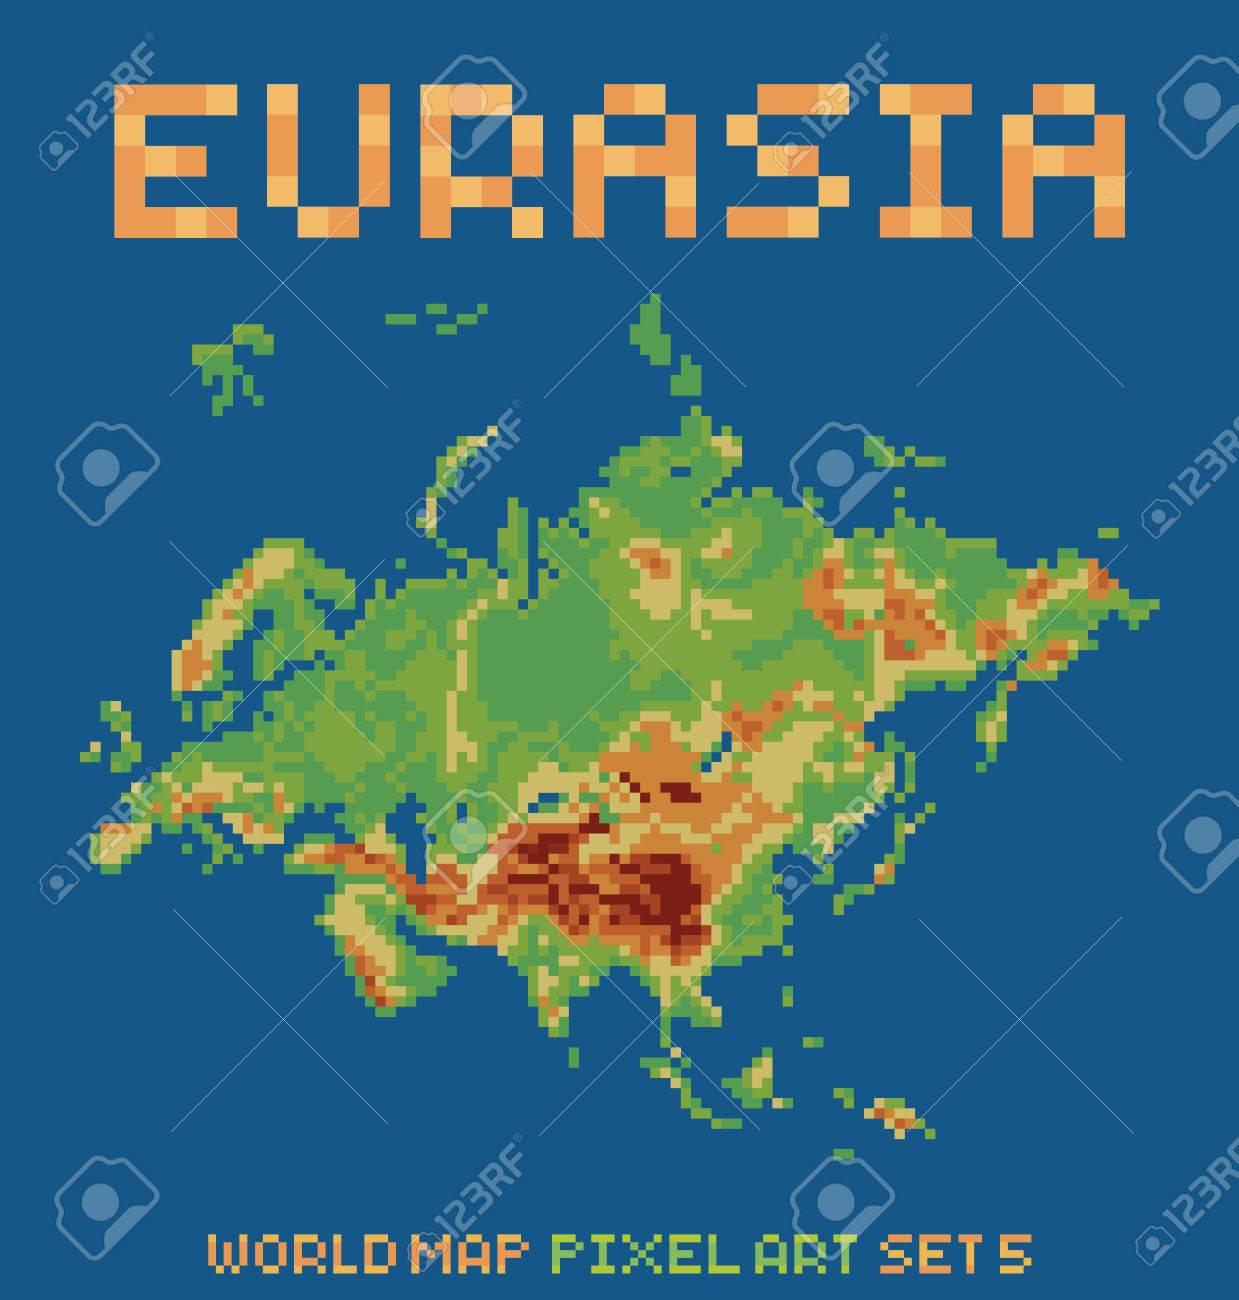 Pixel art style illustration of eurasia physical world map pixel art style illustration of eurasia physical world map isolated on dark blue stock vector gumiabroncs Gallery